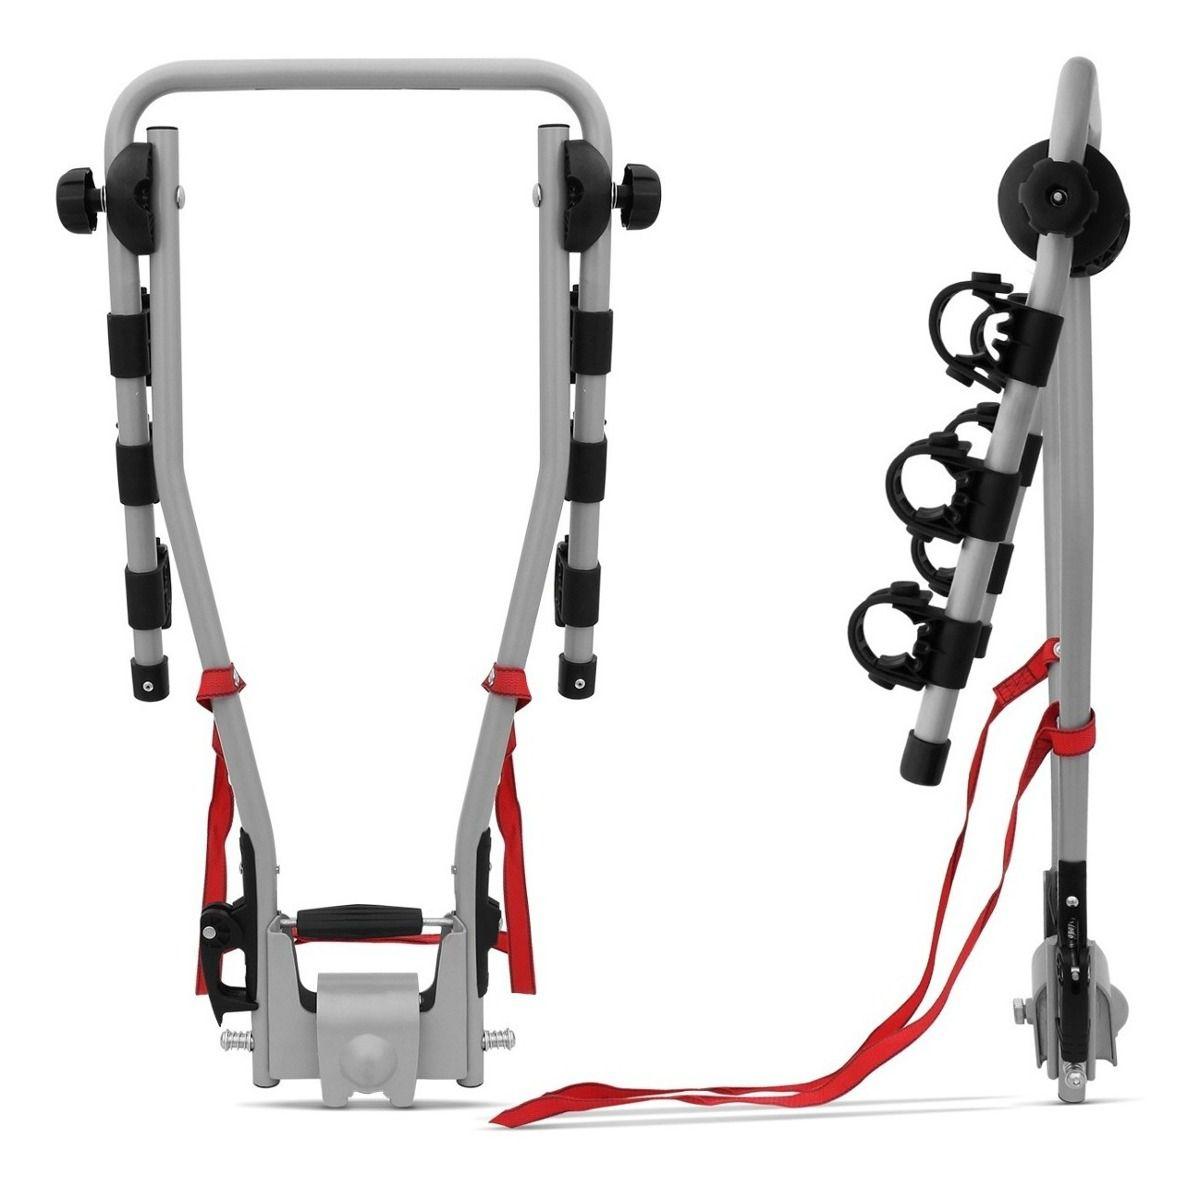 Transbike Para Engate C3x Eqmax Para 3 Bicicletas Inclinável